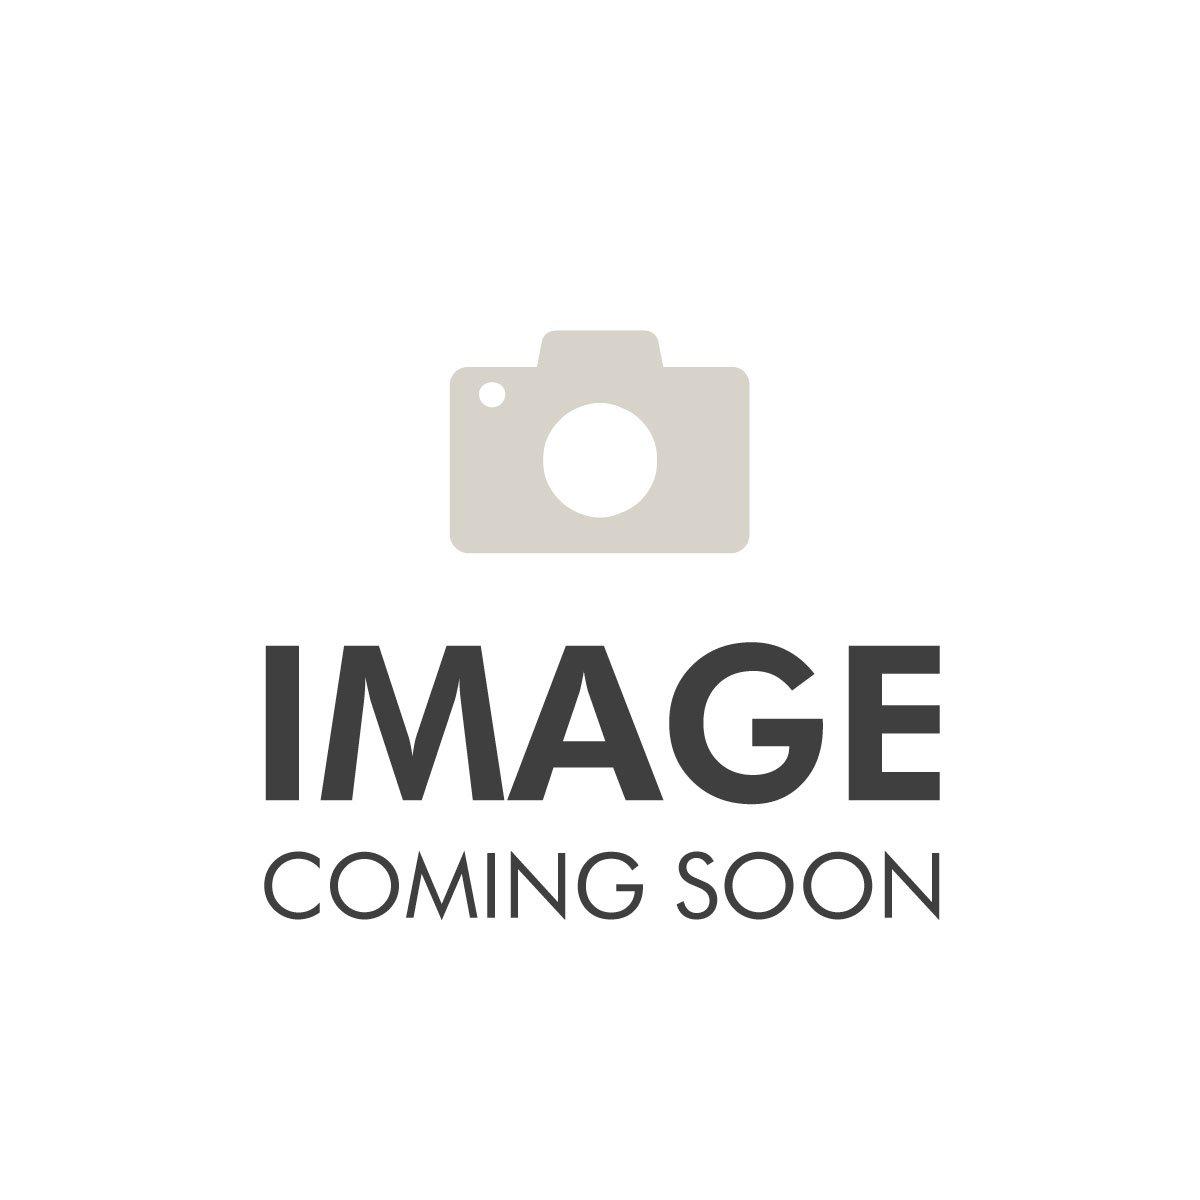 Leon Paul - Midi-Fence - Coquille de sabre